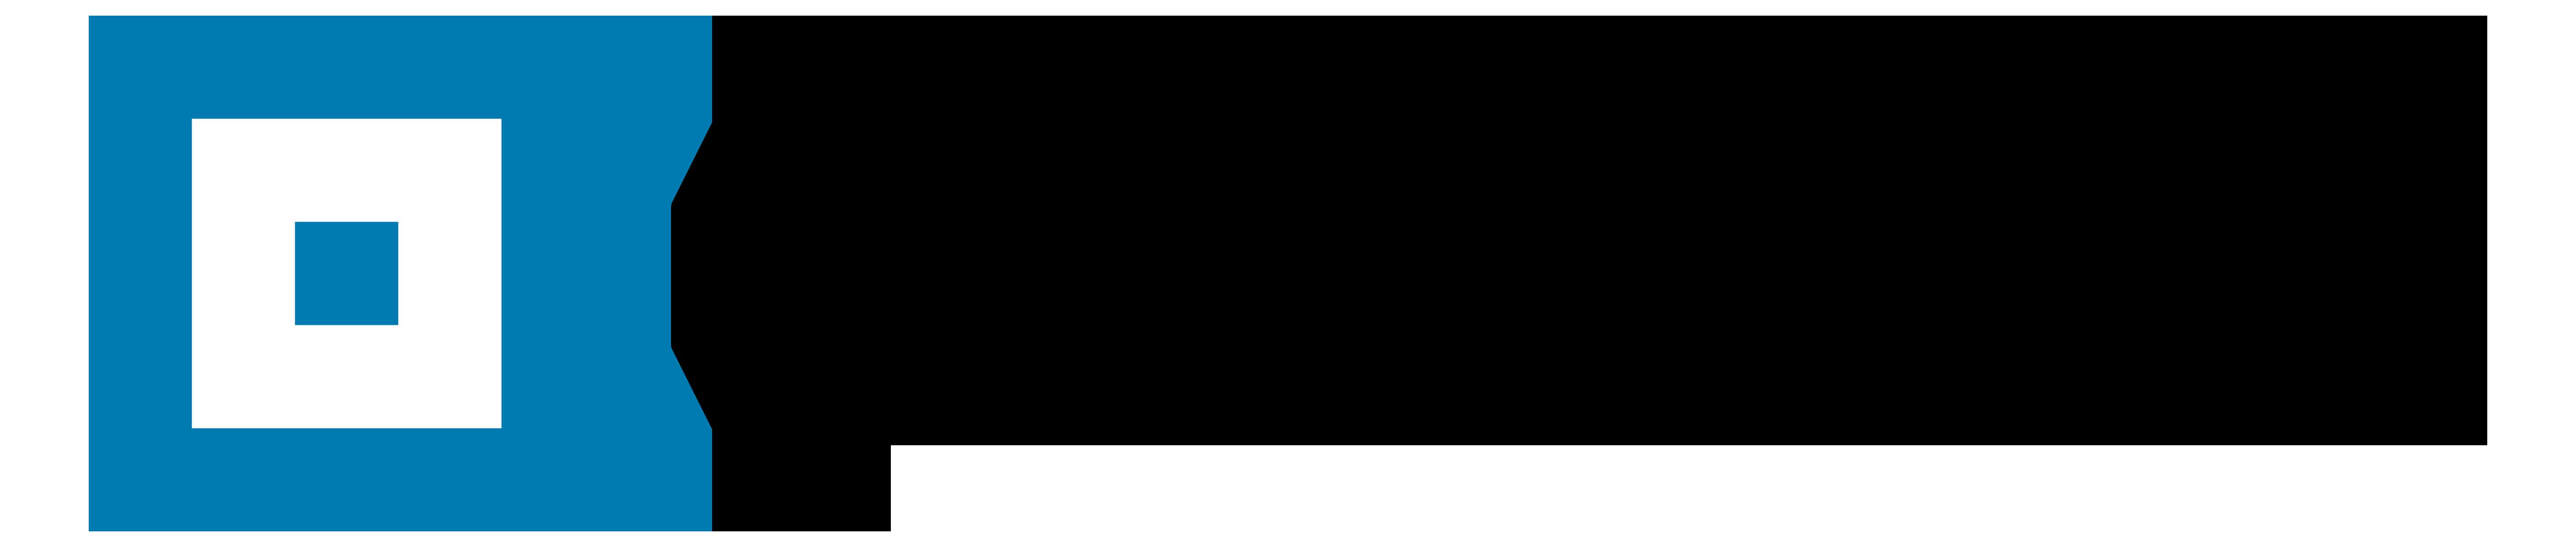 FTP logo 5